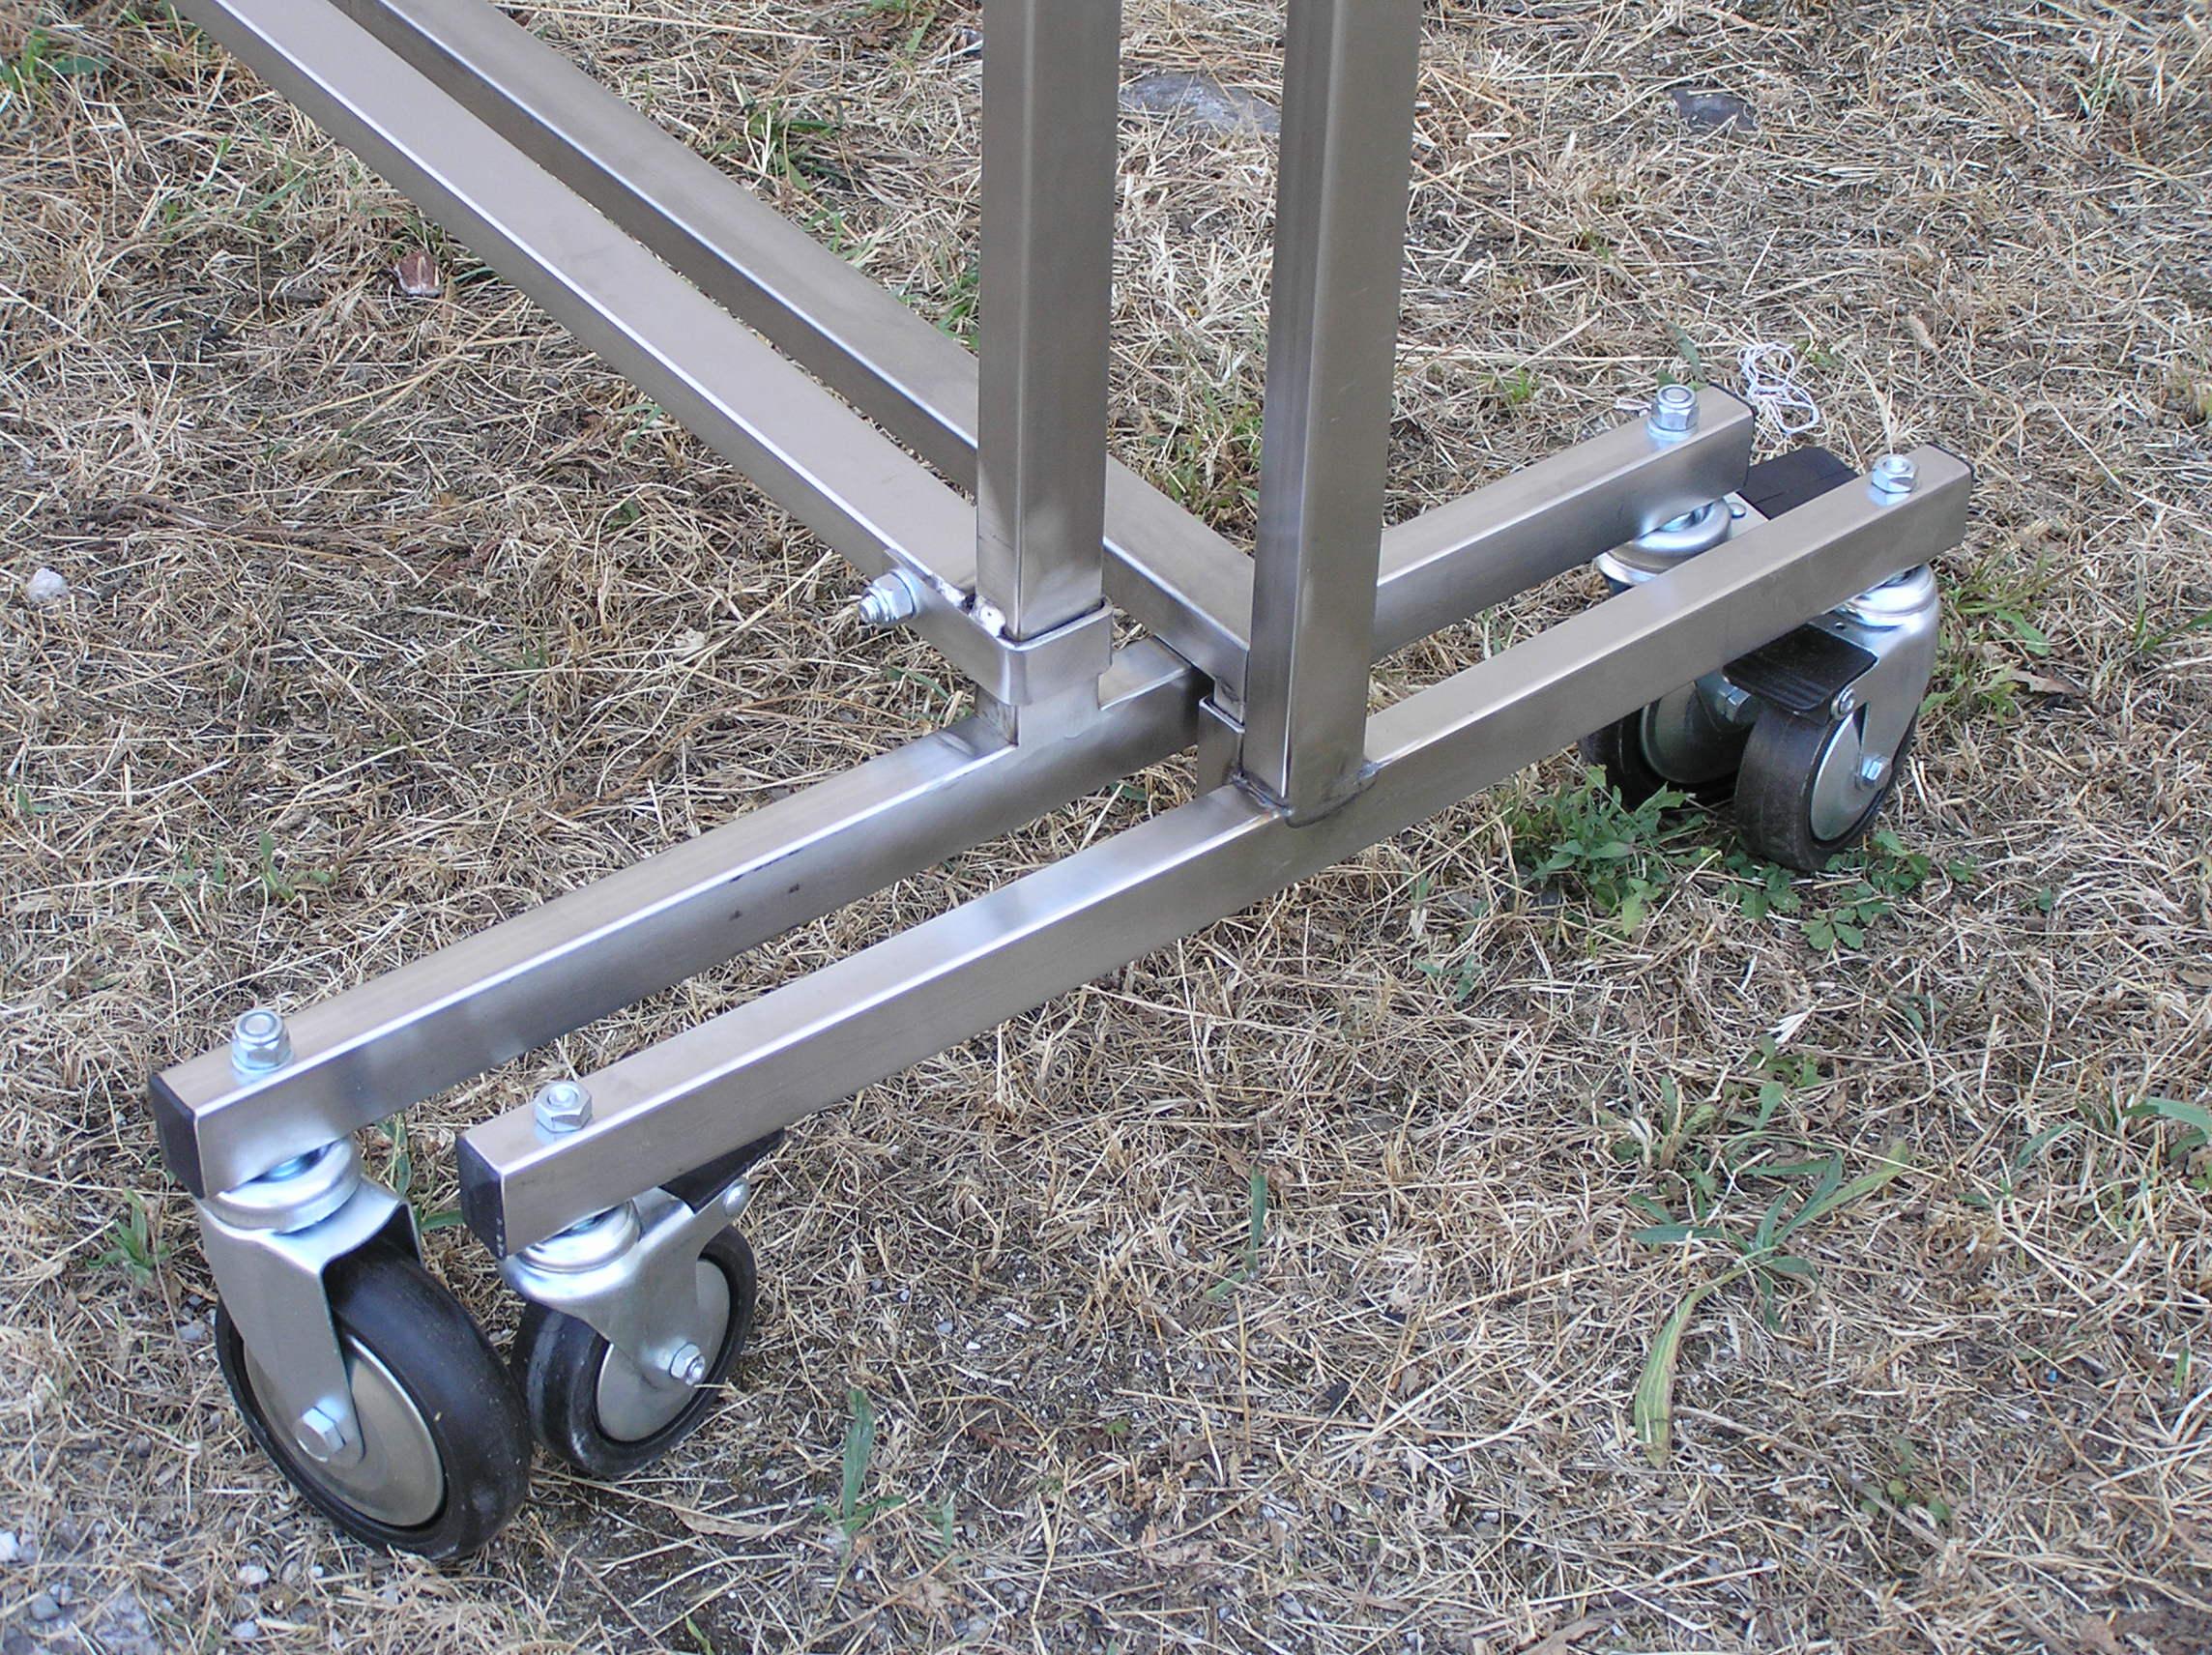 Stender porta abiti in acciaio inox impilabili - poco ingombro